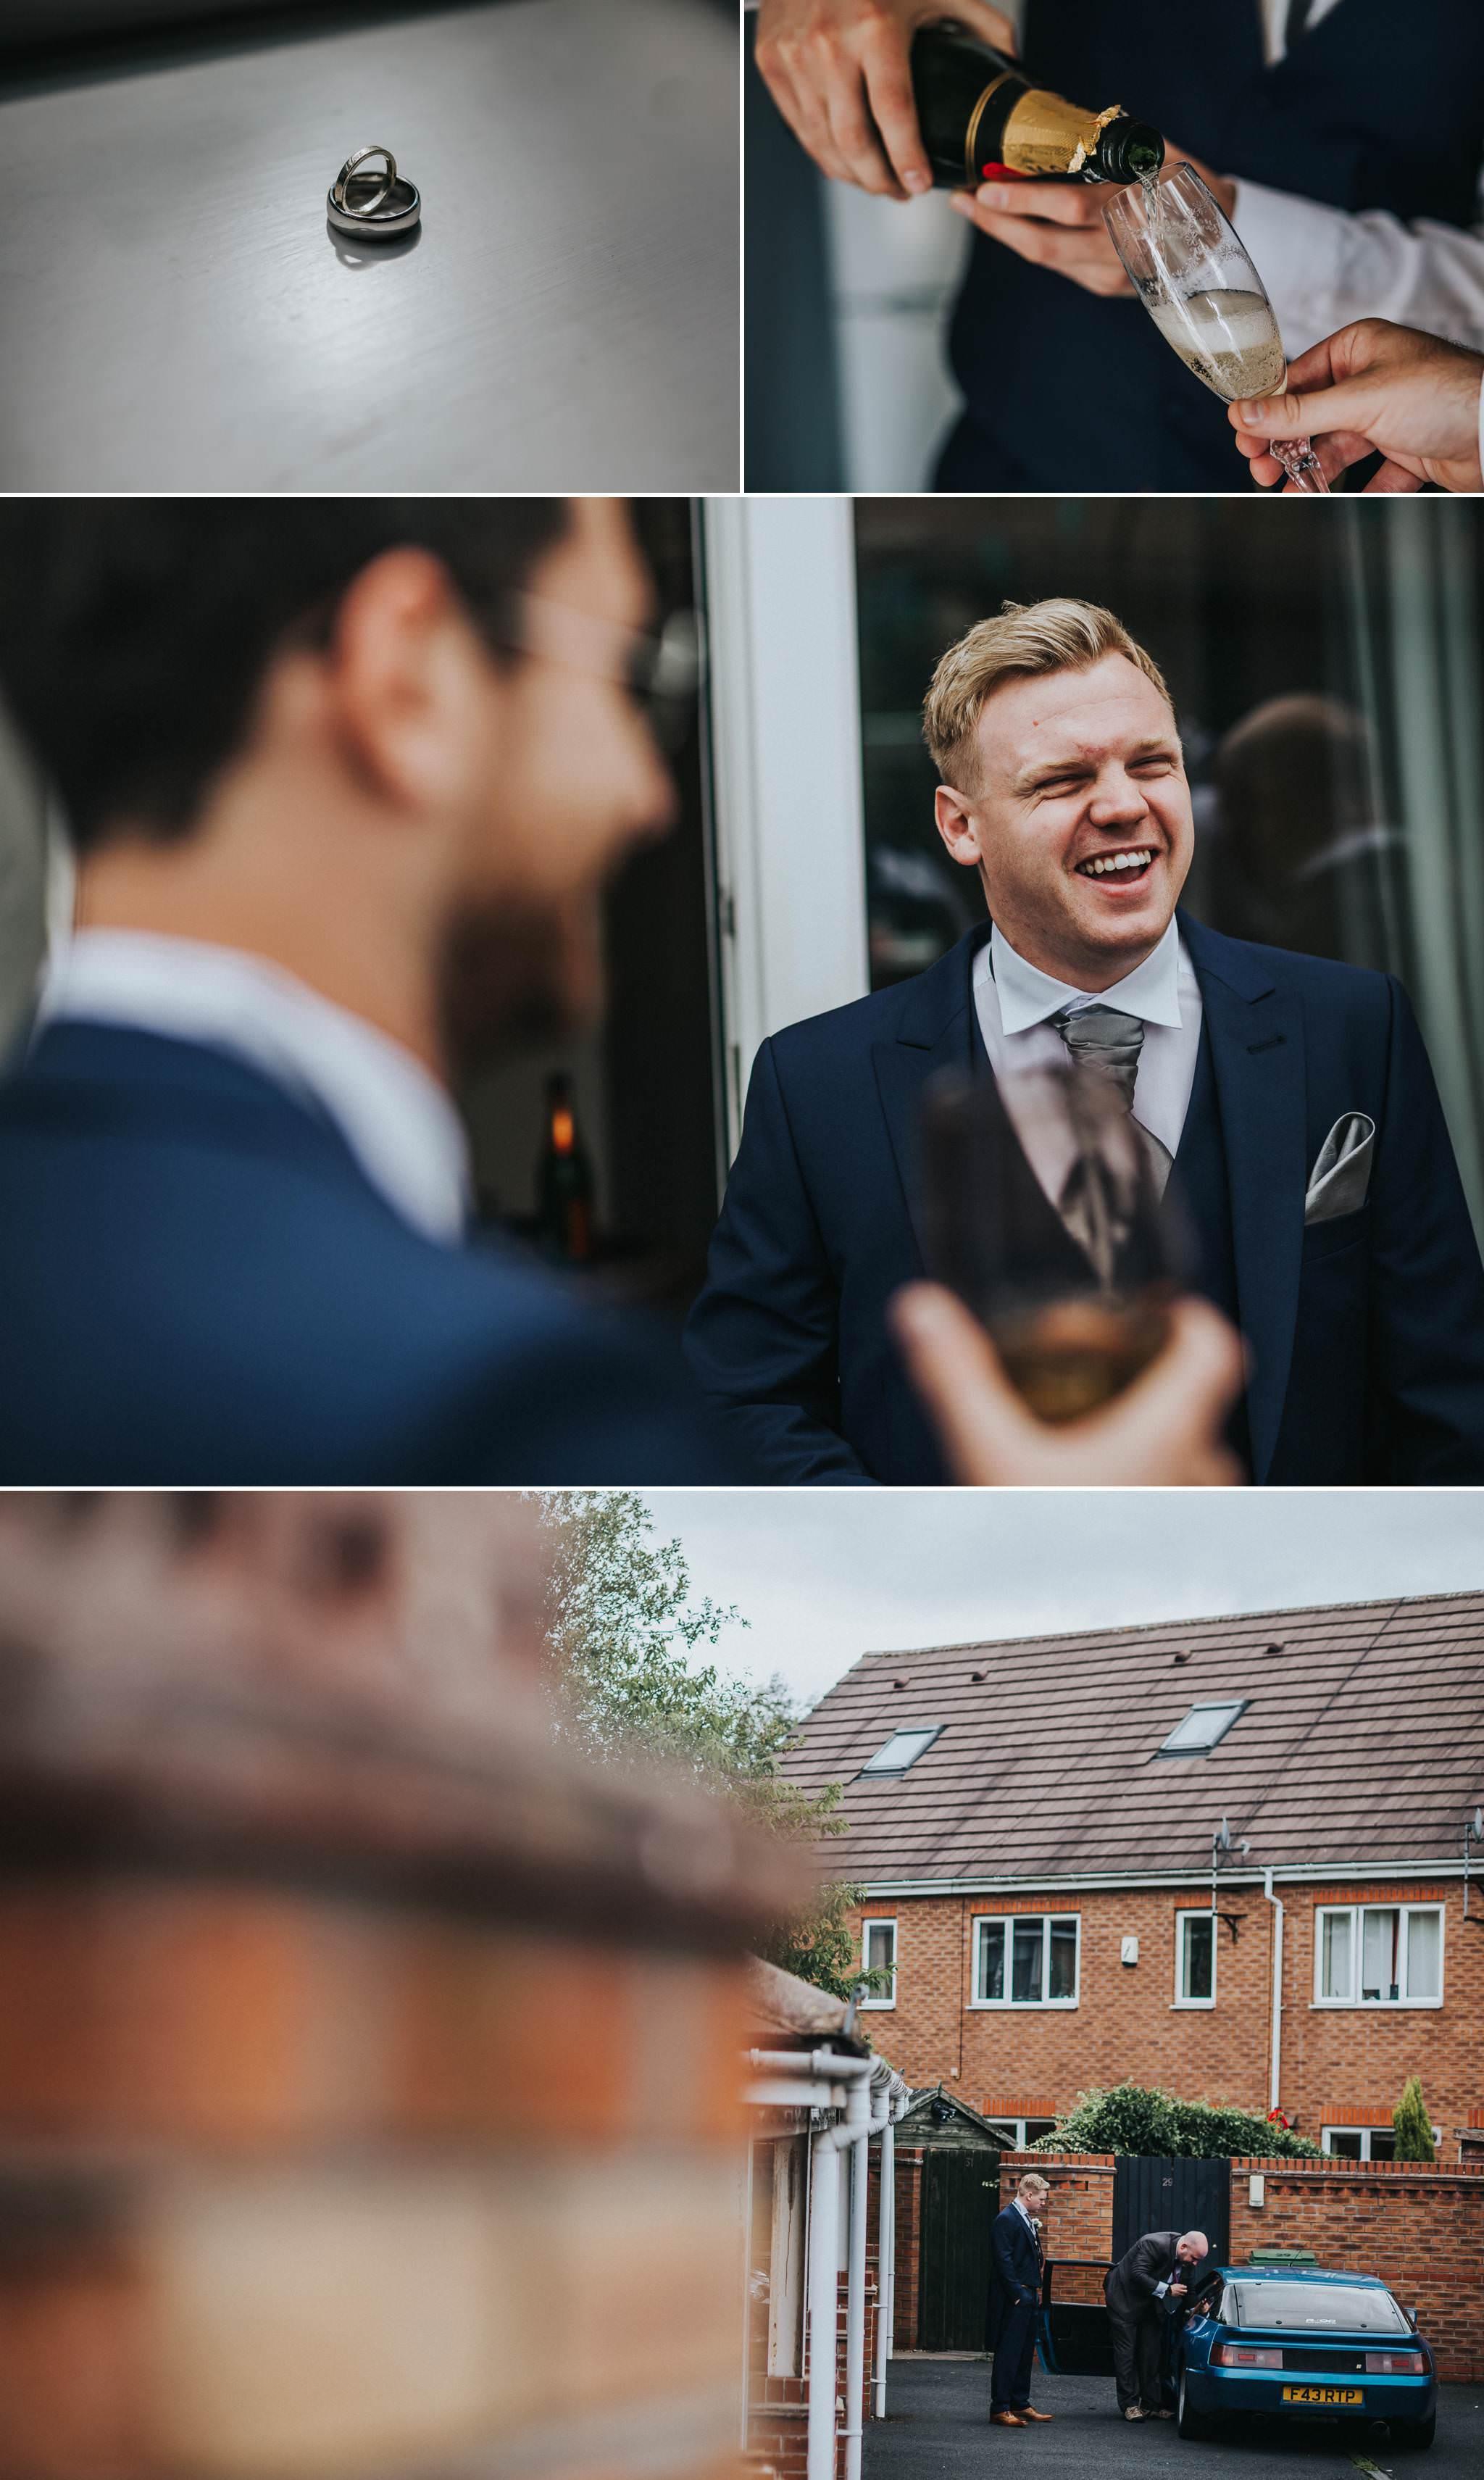 somerford-hall-wedding-photography 6.jpg